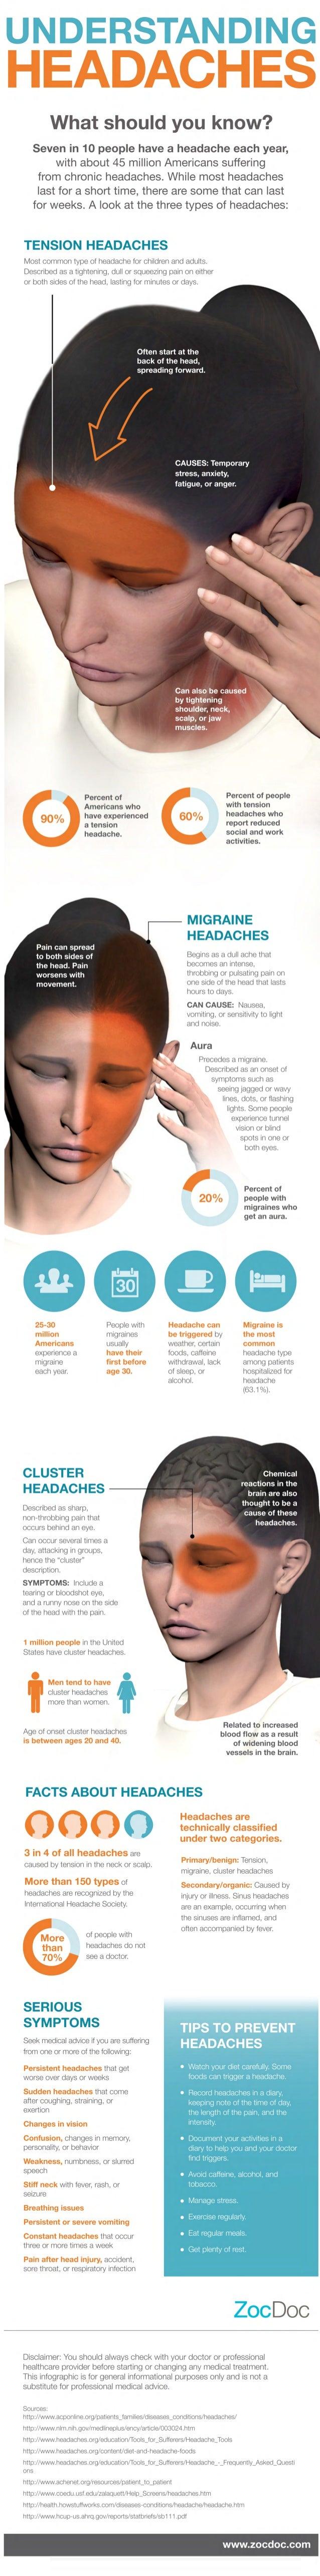 Types Of Headaches #zocdoc